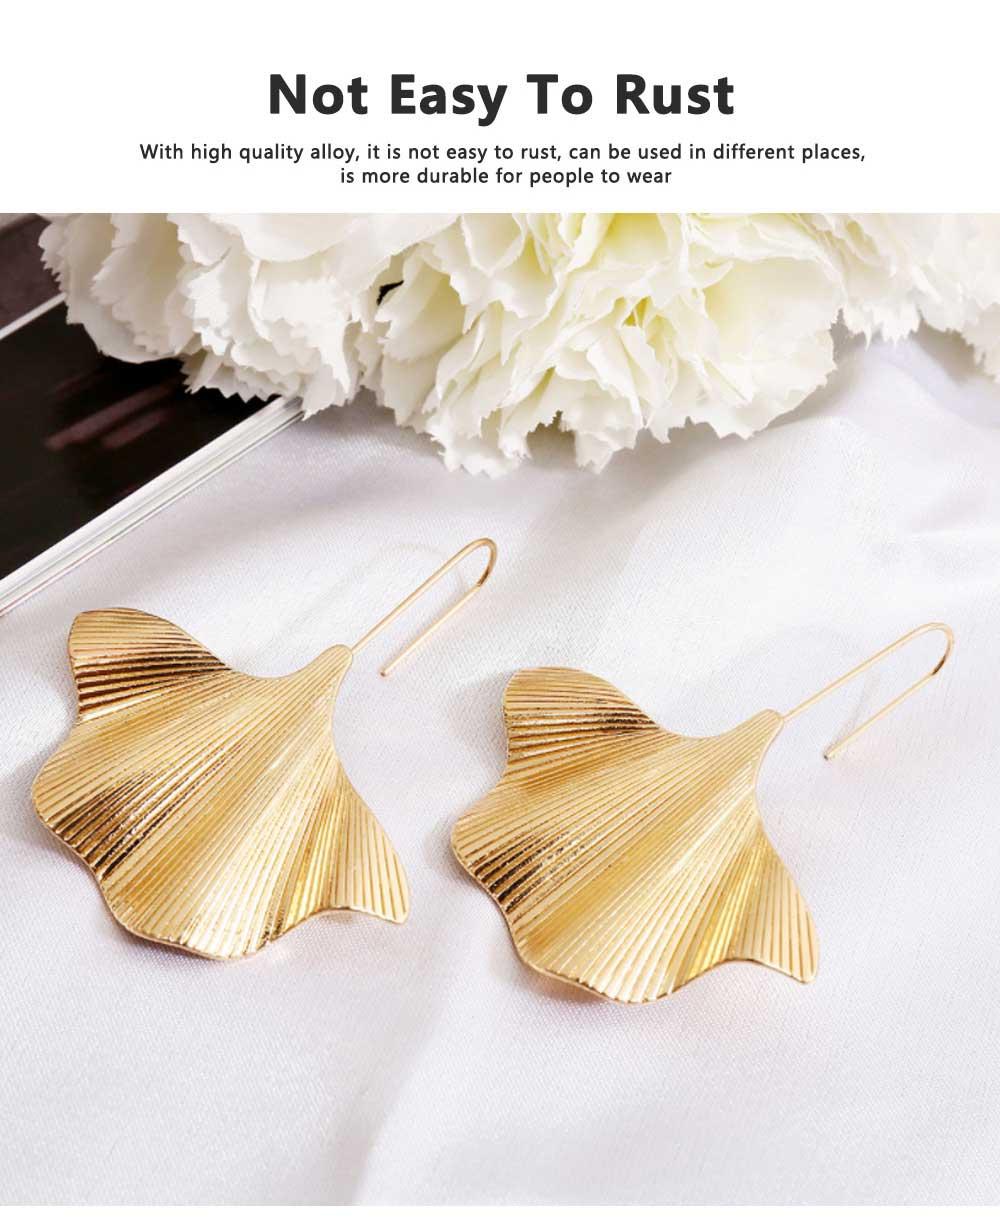 Minimalist Alloy Gold Ginkgo Biloba Leaf Simple Folded Female Hammered Creative Stud Earrings Multi Layer Acrylic Bohemian Fashion Jewellery 3